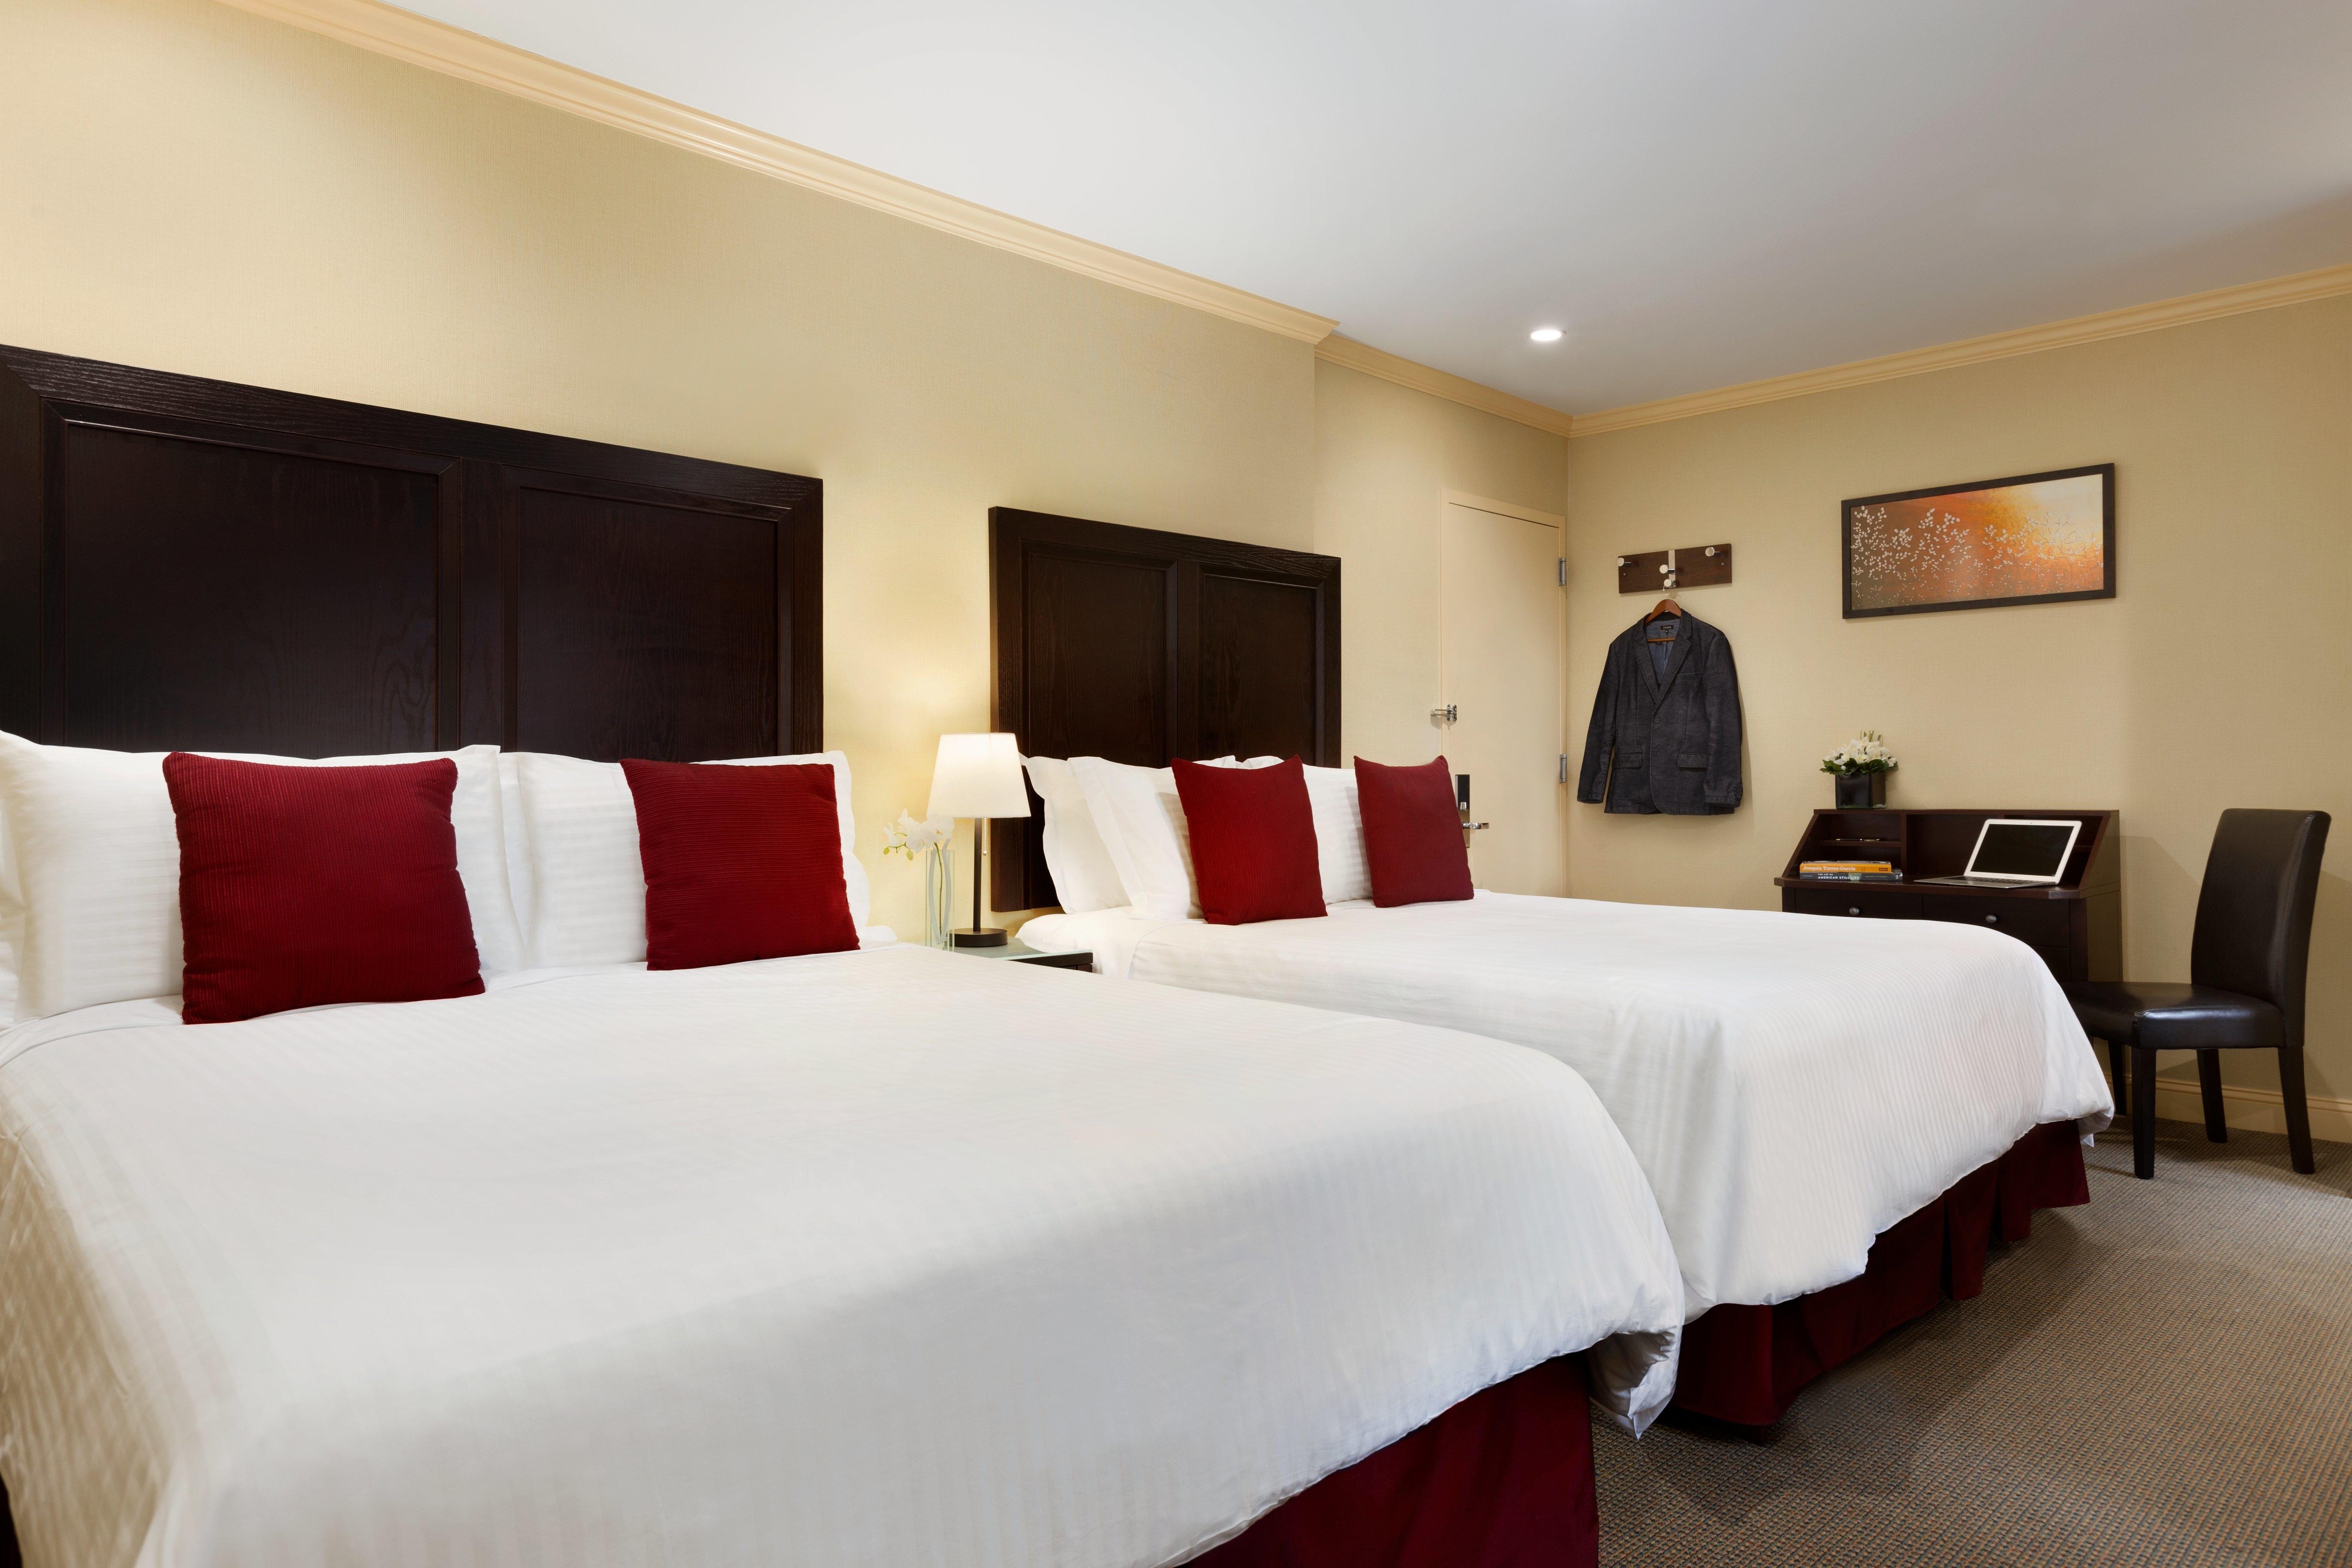 Washington Jefferson Hotel